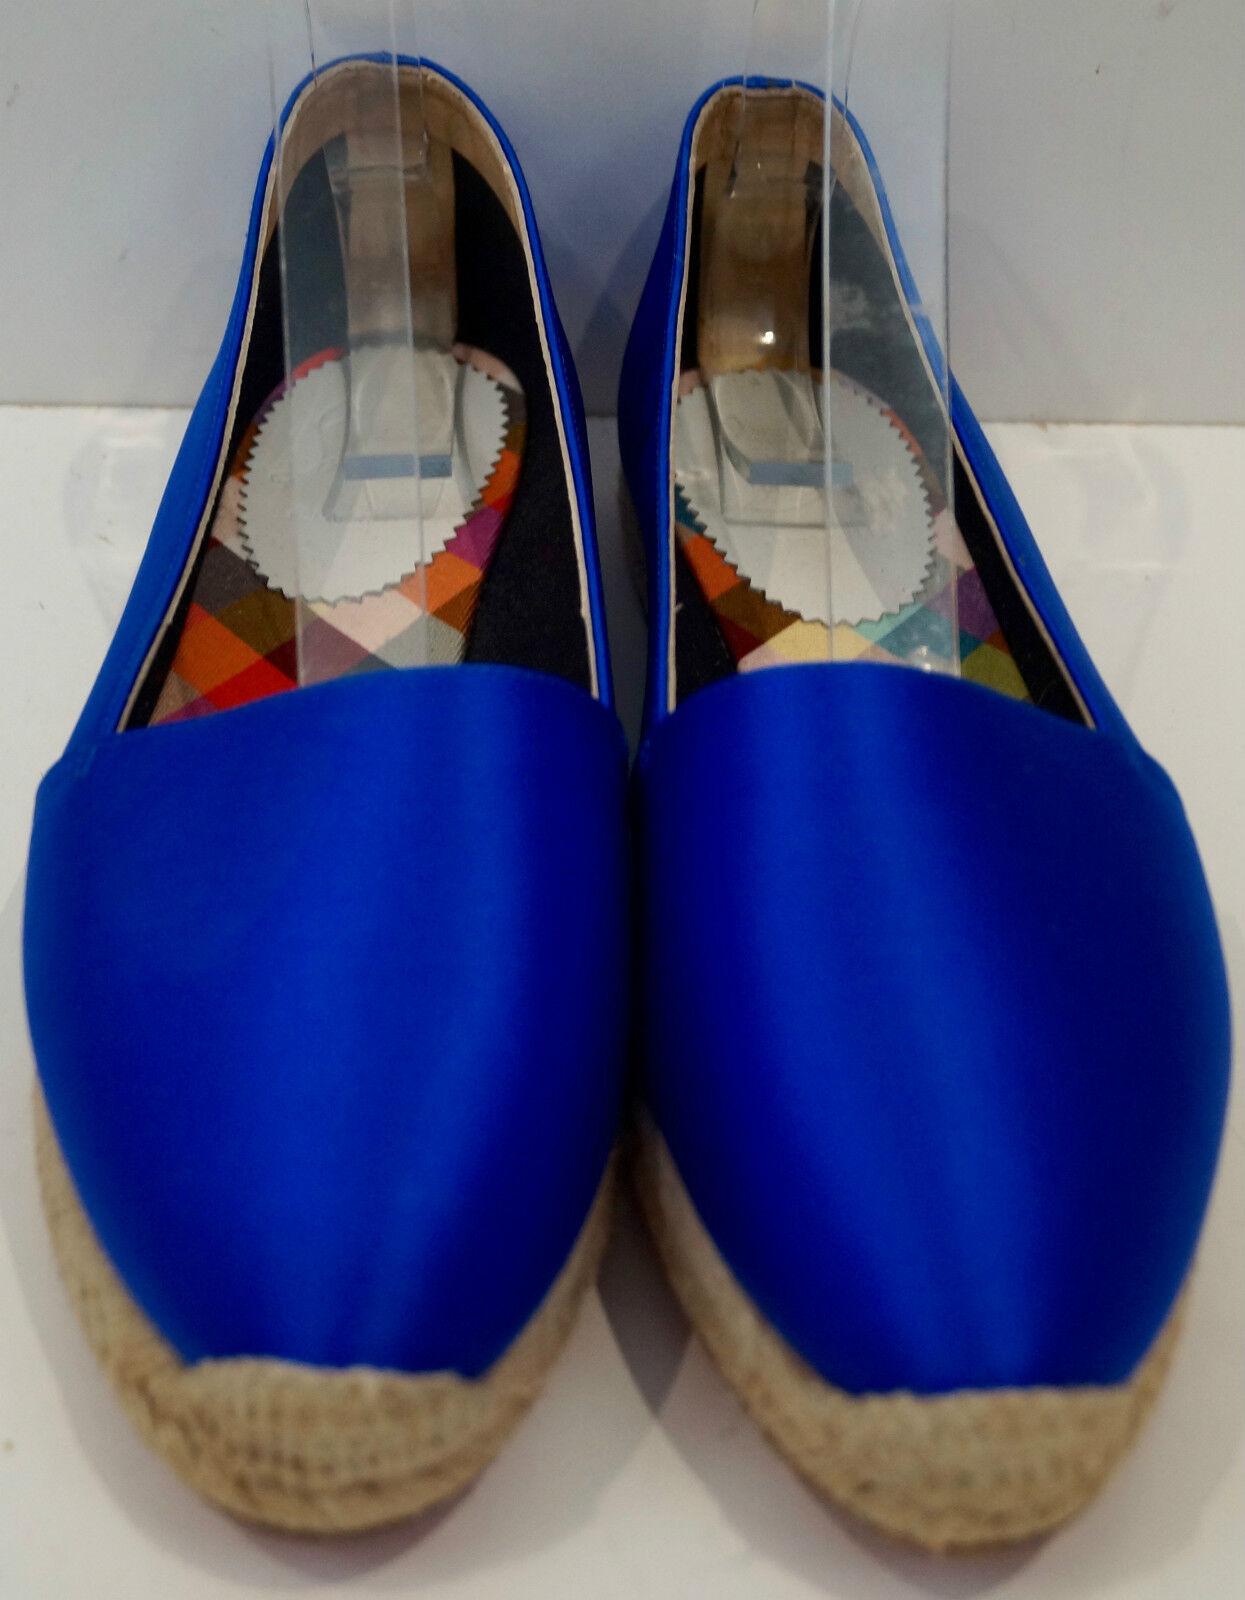 CHRISTIAN LOUBOUTIN Colbalt blau Satin Slip On Espadrilles 40 schuhes 40 Espadrilles UK7 - New c6f109